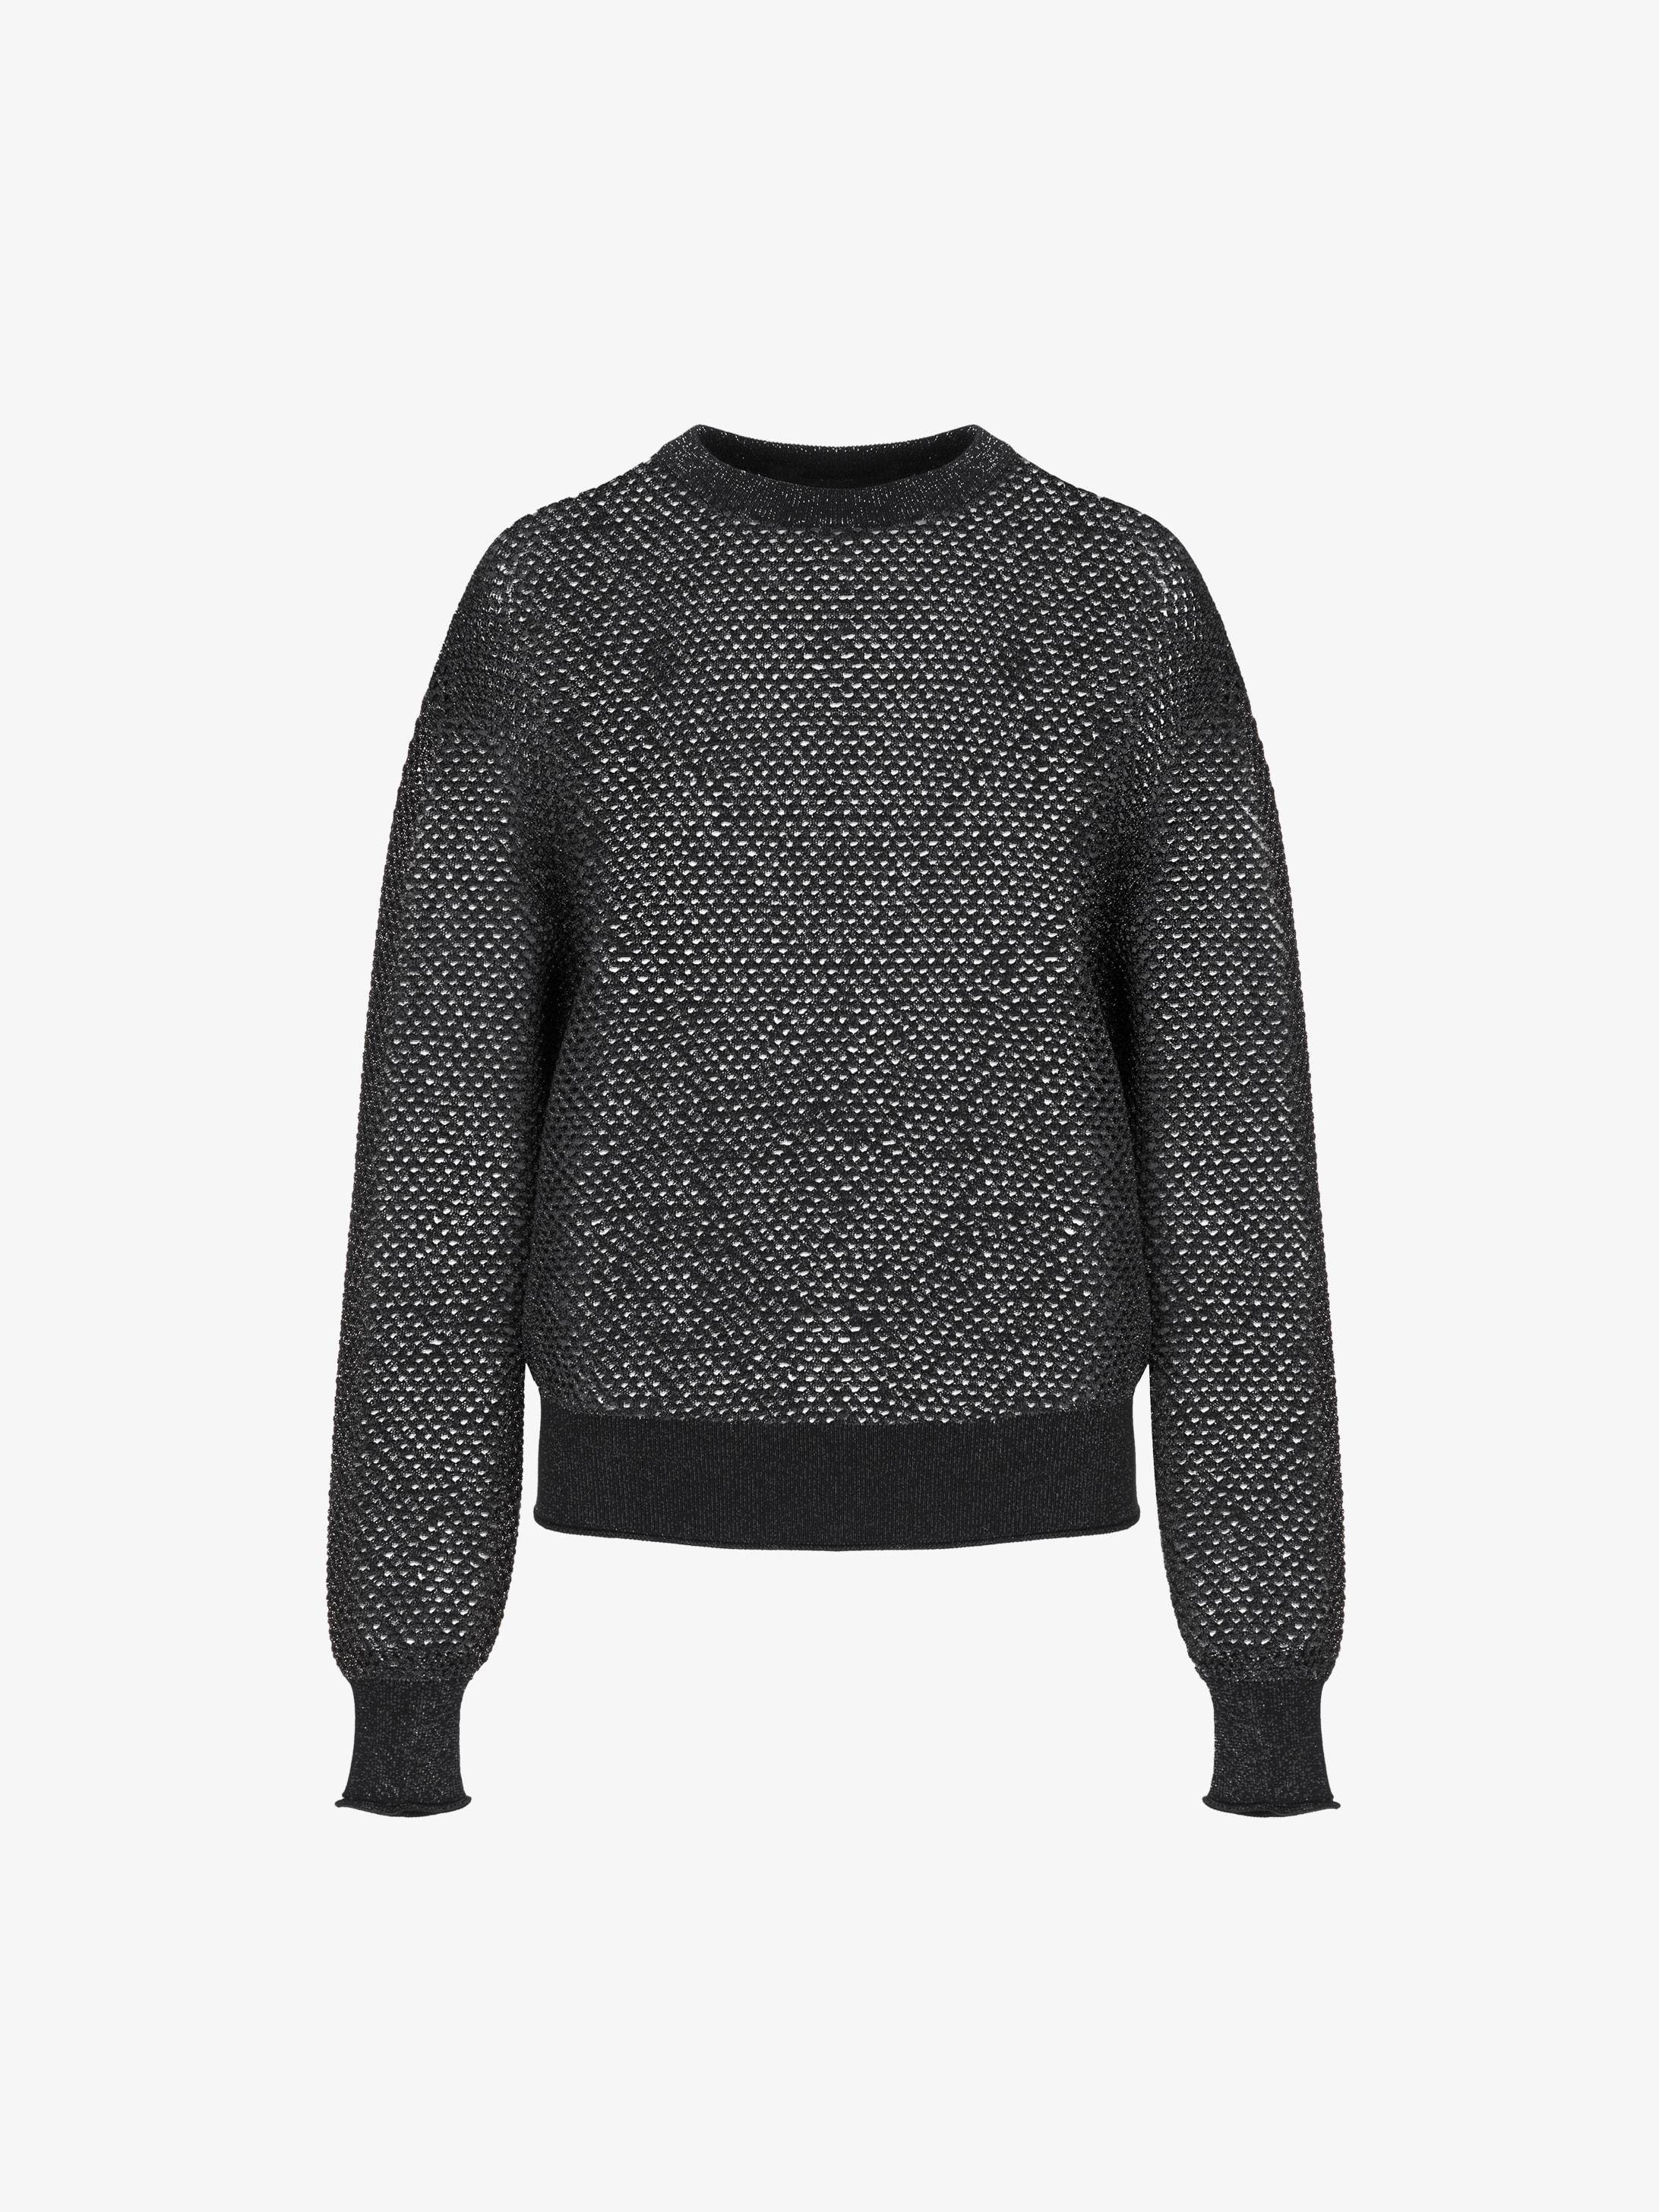 Crew neck mesh sweater in lurex